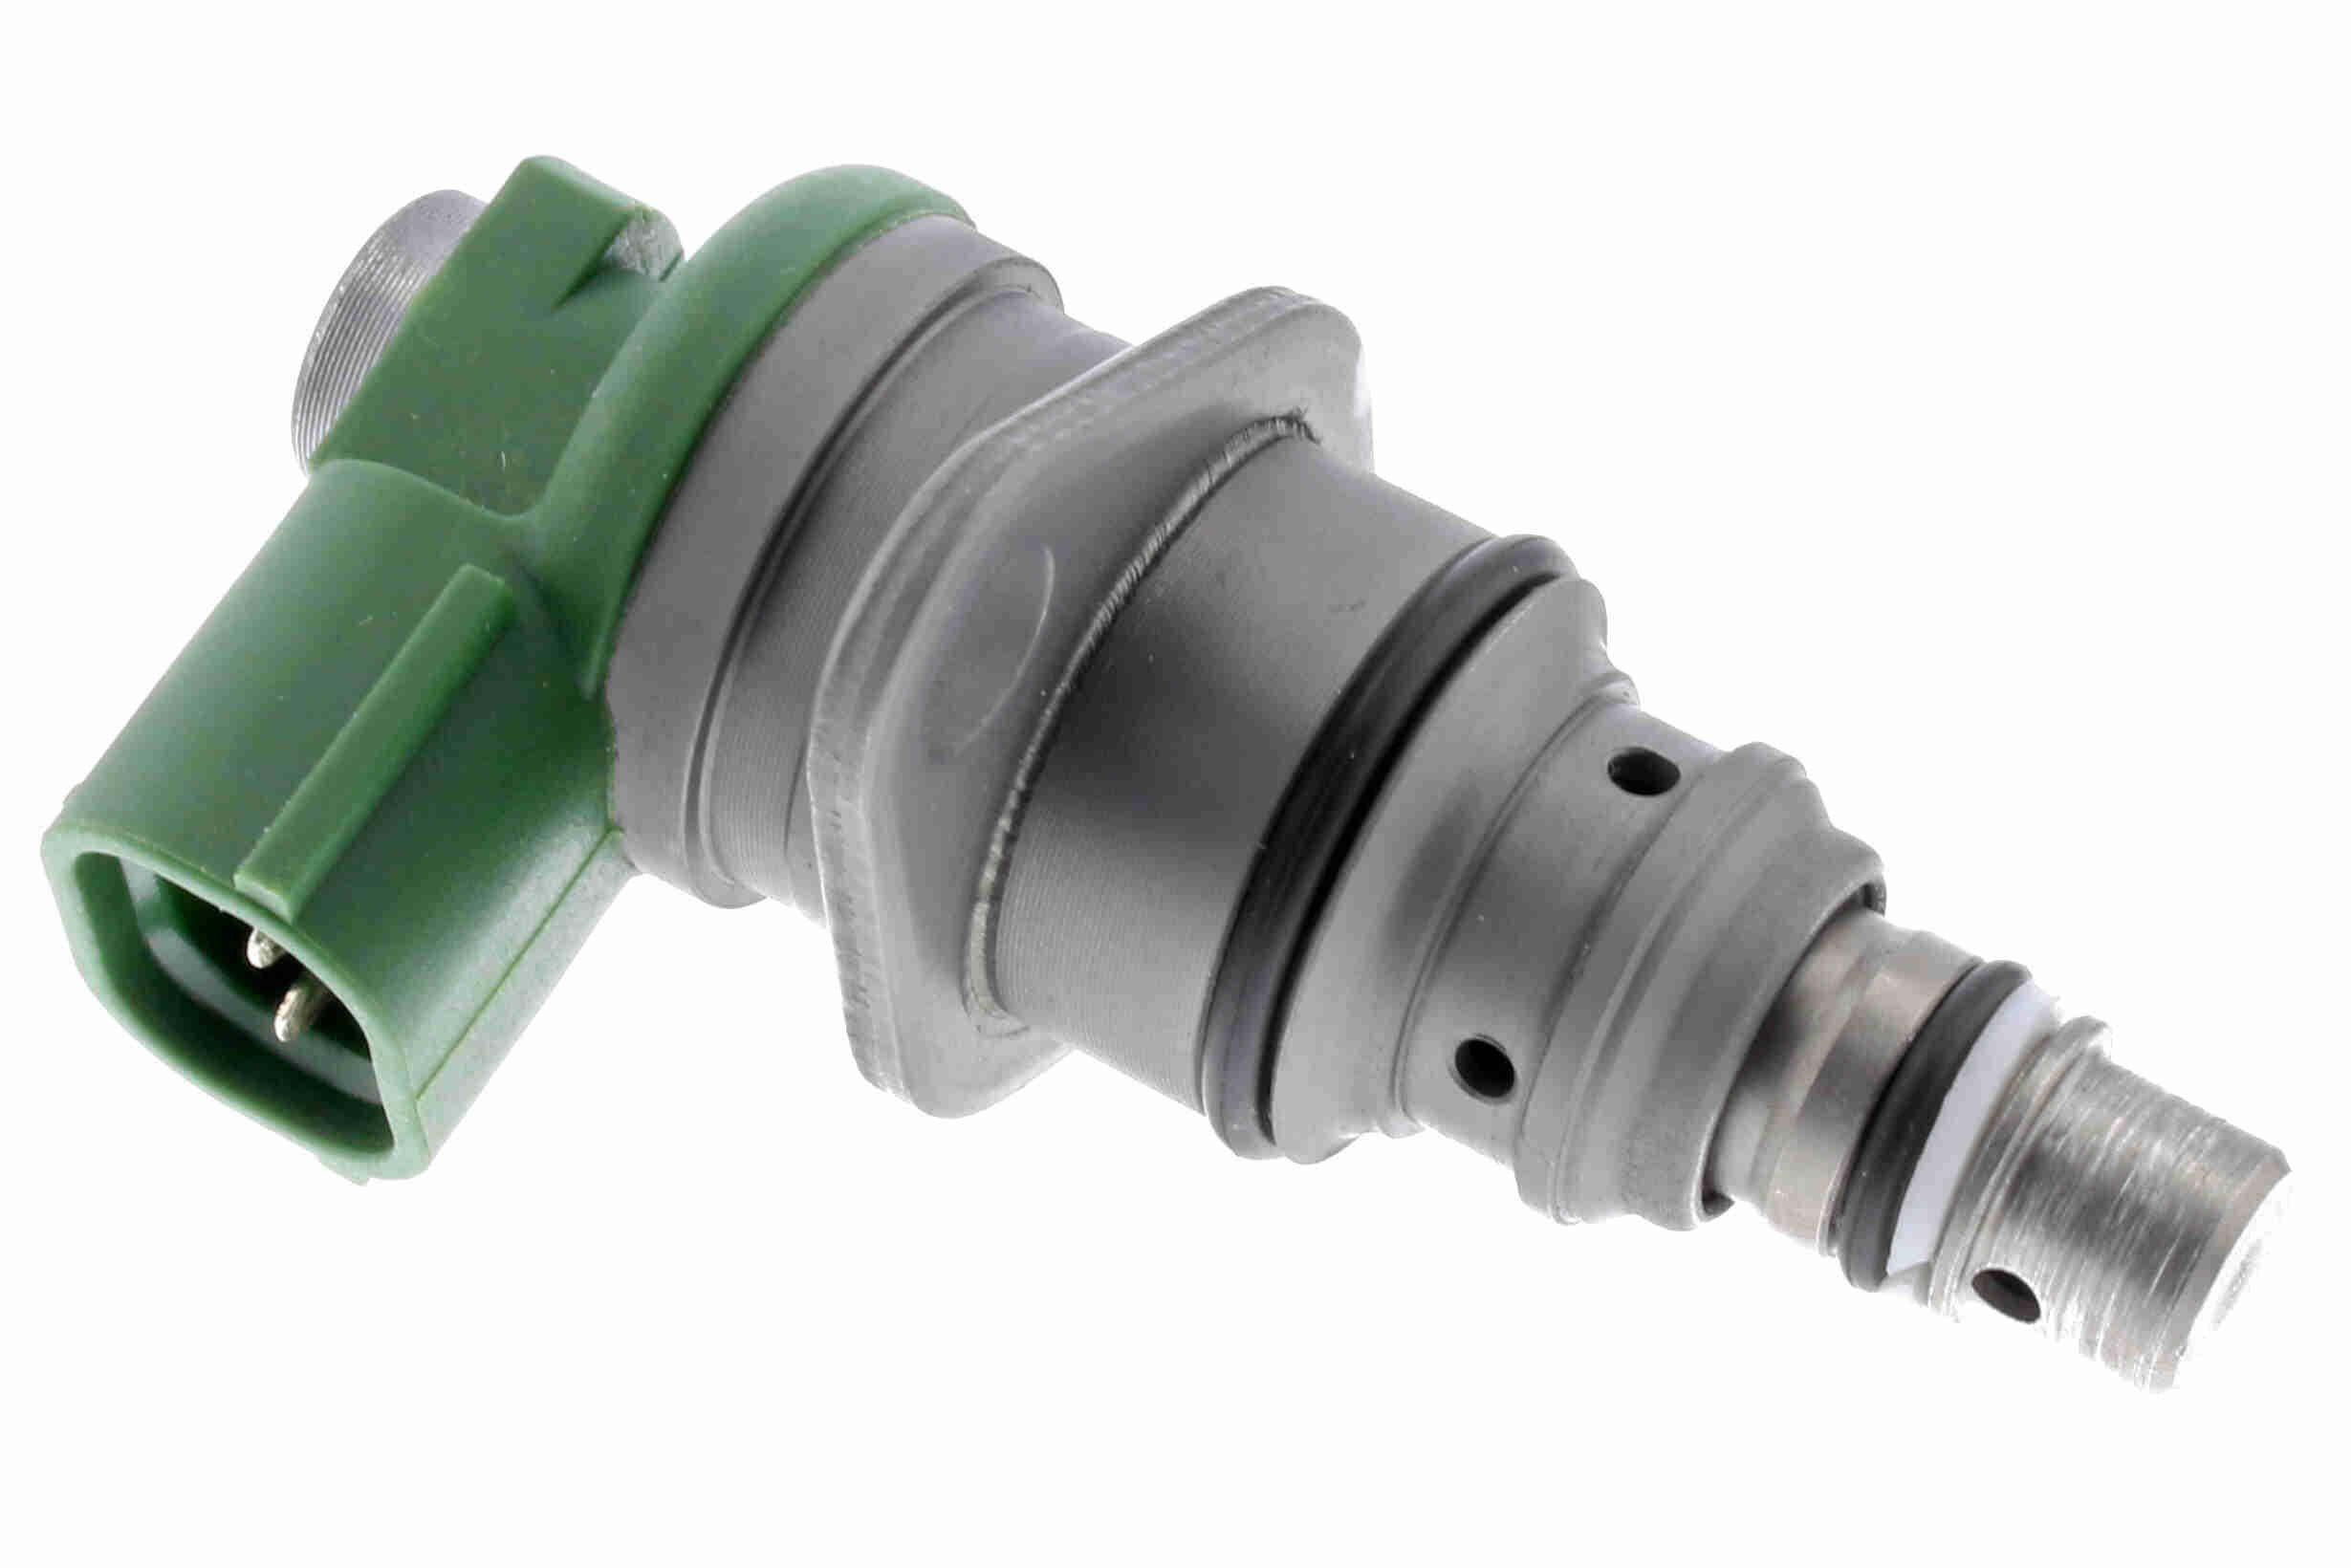 OE Original Kraftstoffdruckregler A70-11-0006 ACKOJA